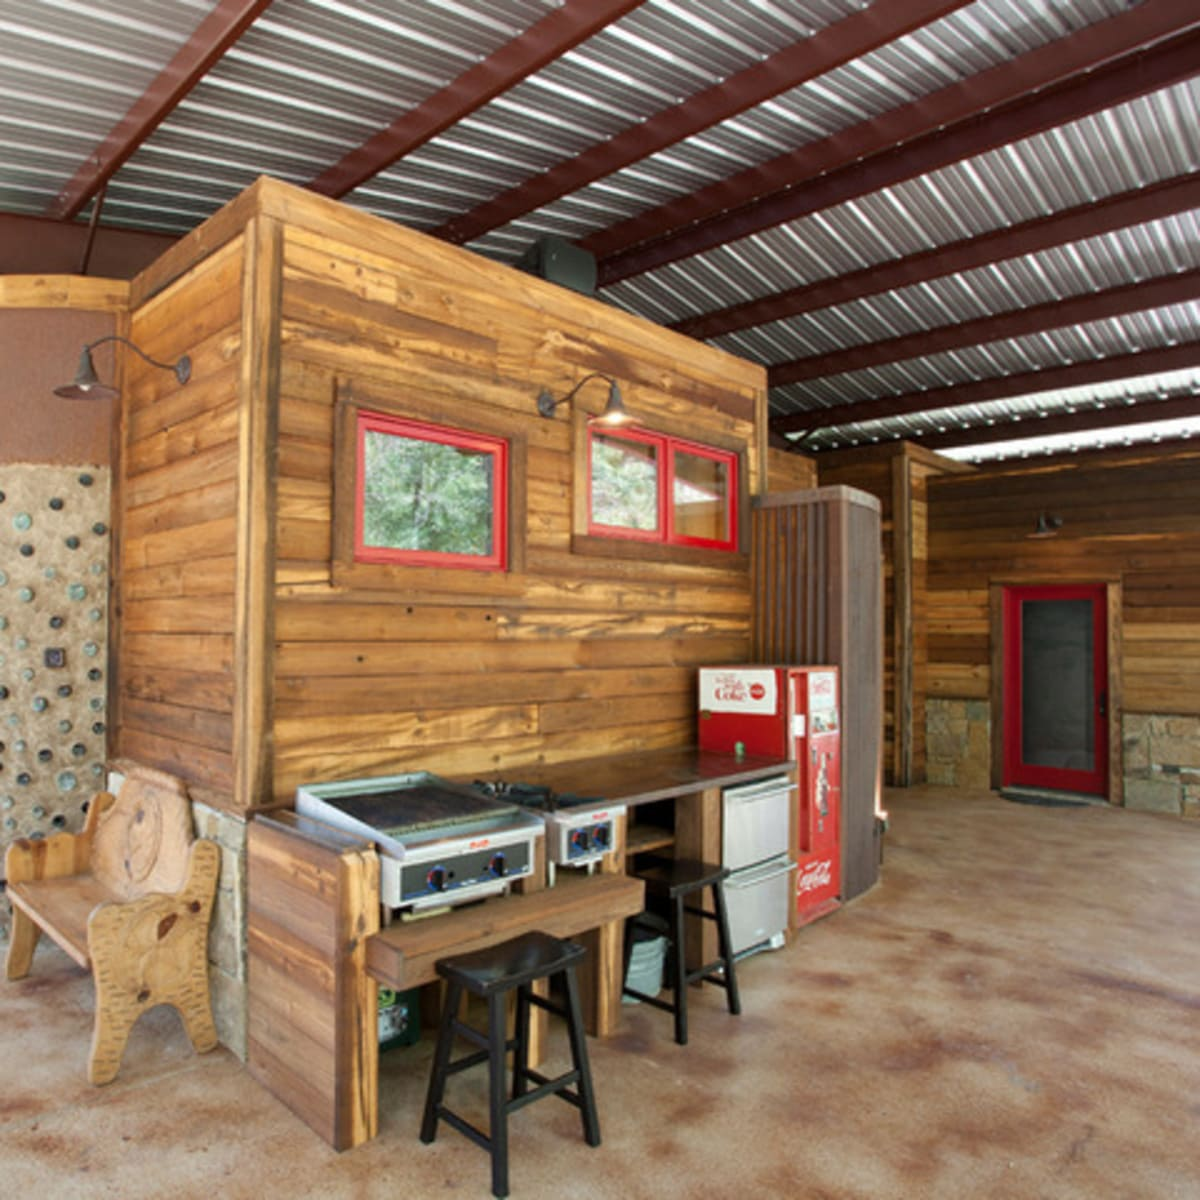 Hawkins, Texas, Houzz home tour